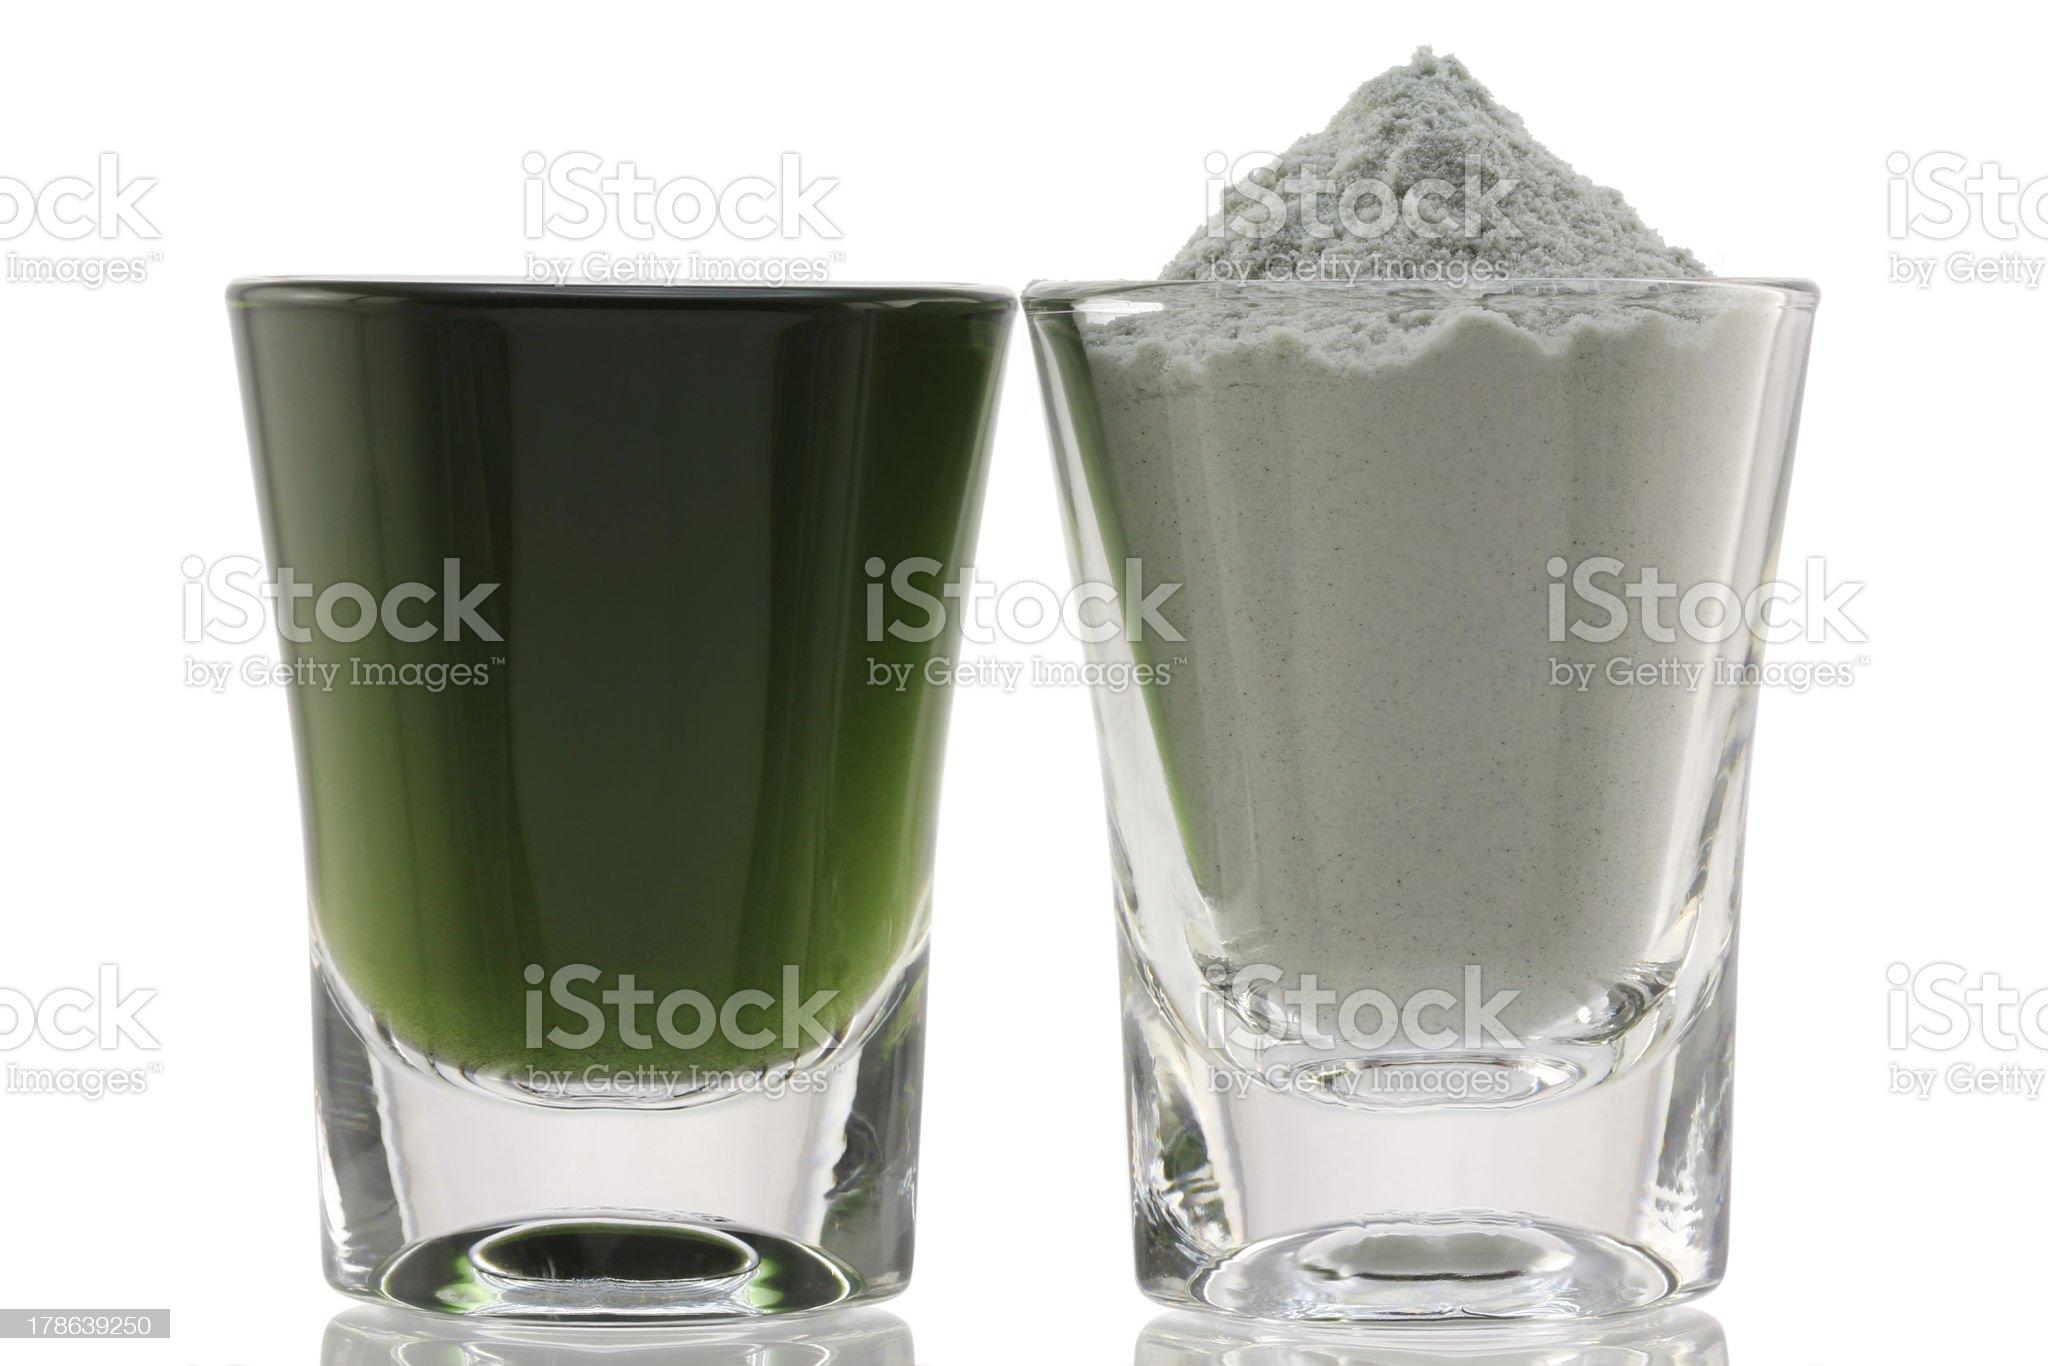 Chlorophyll Fine Powder royalty-free stock photo